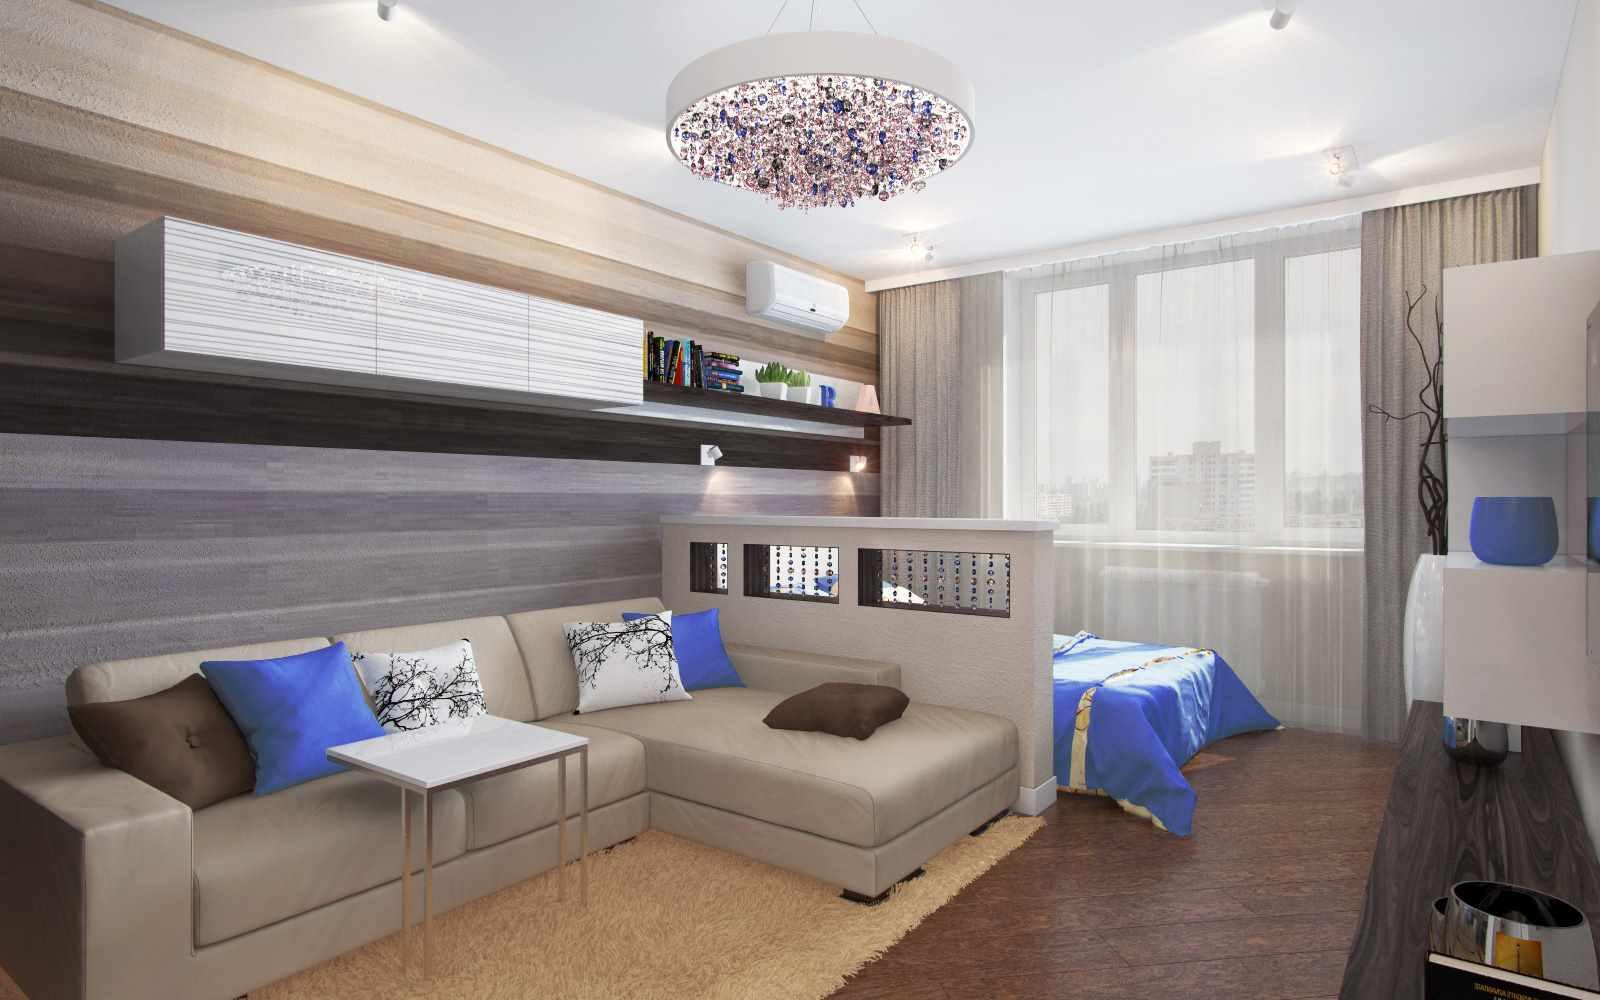 пример светлого декора спальни 15 кв.м